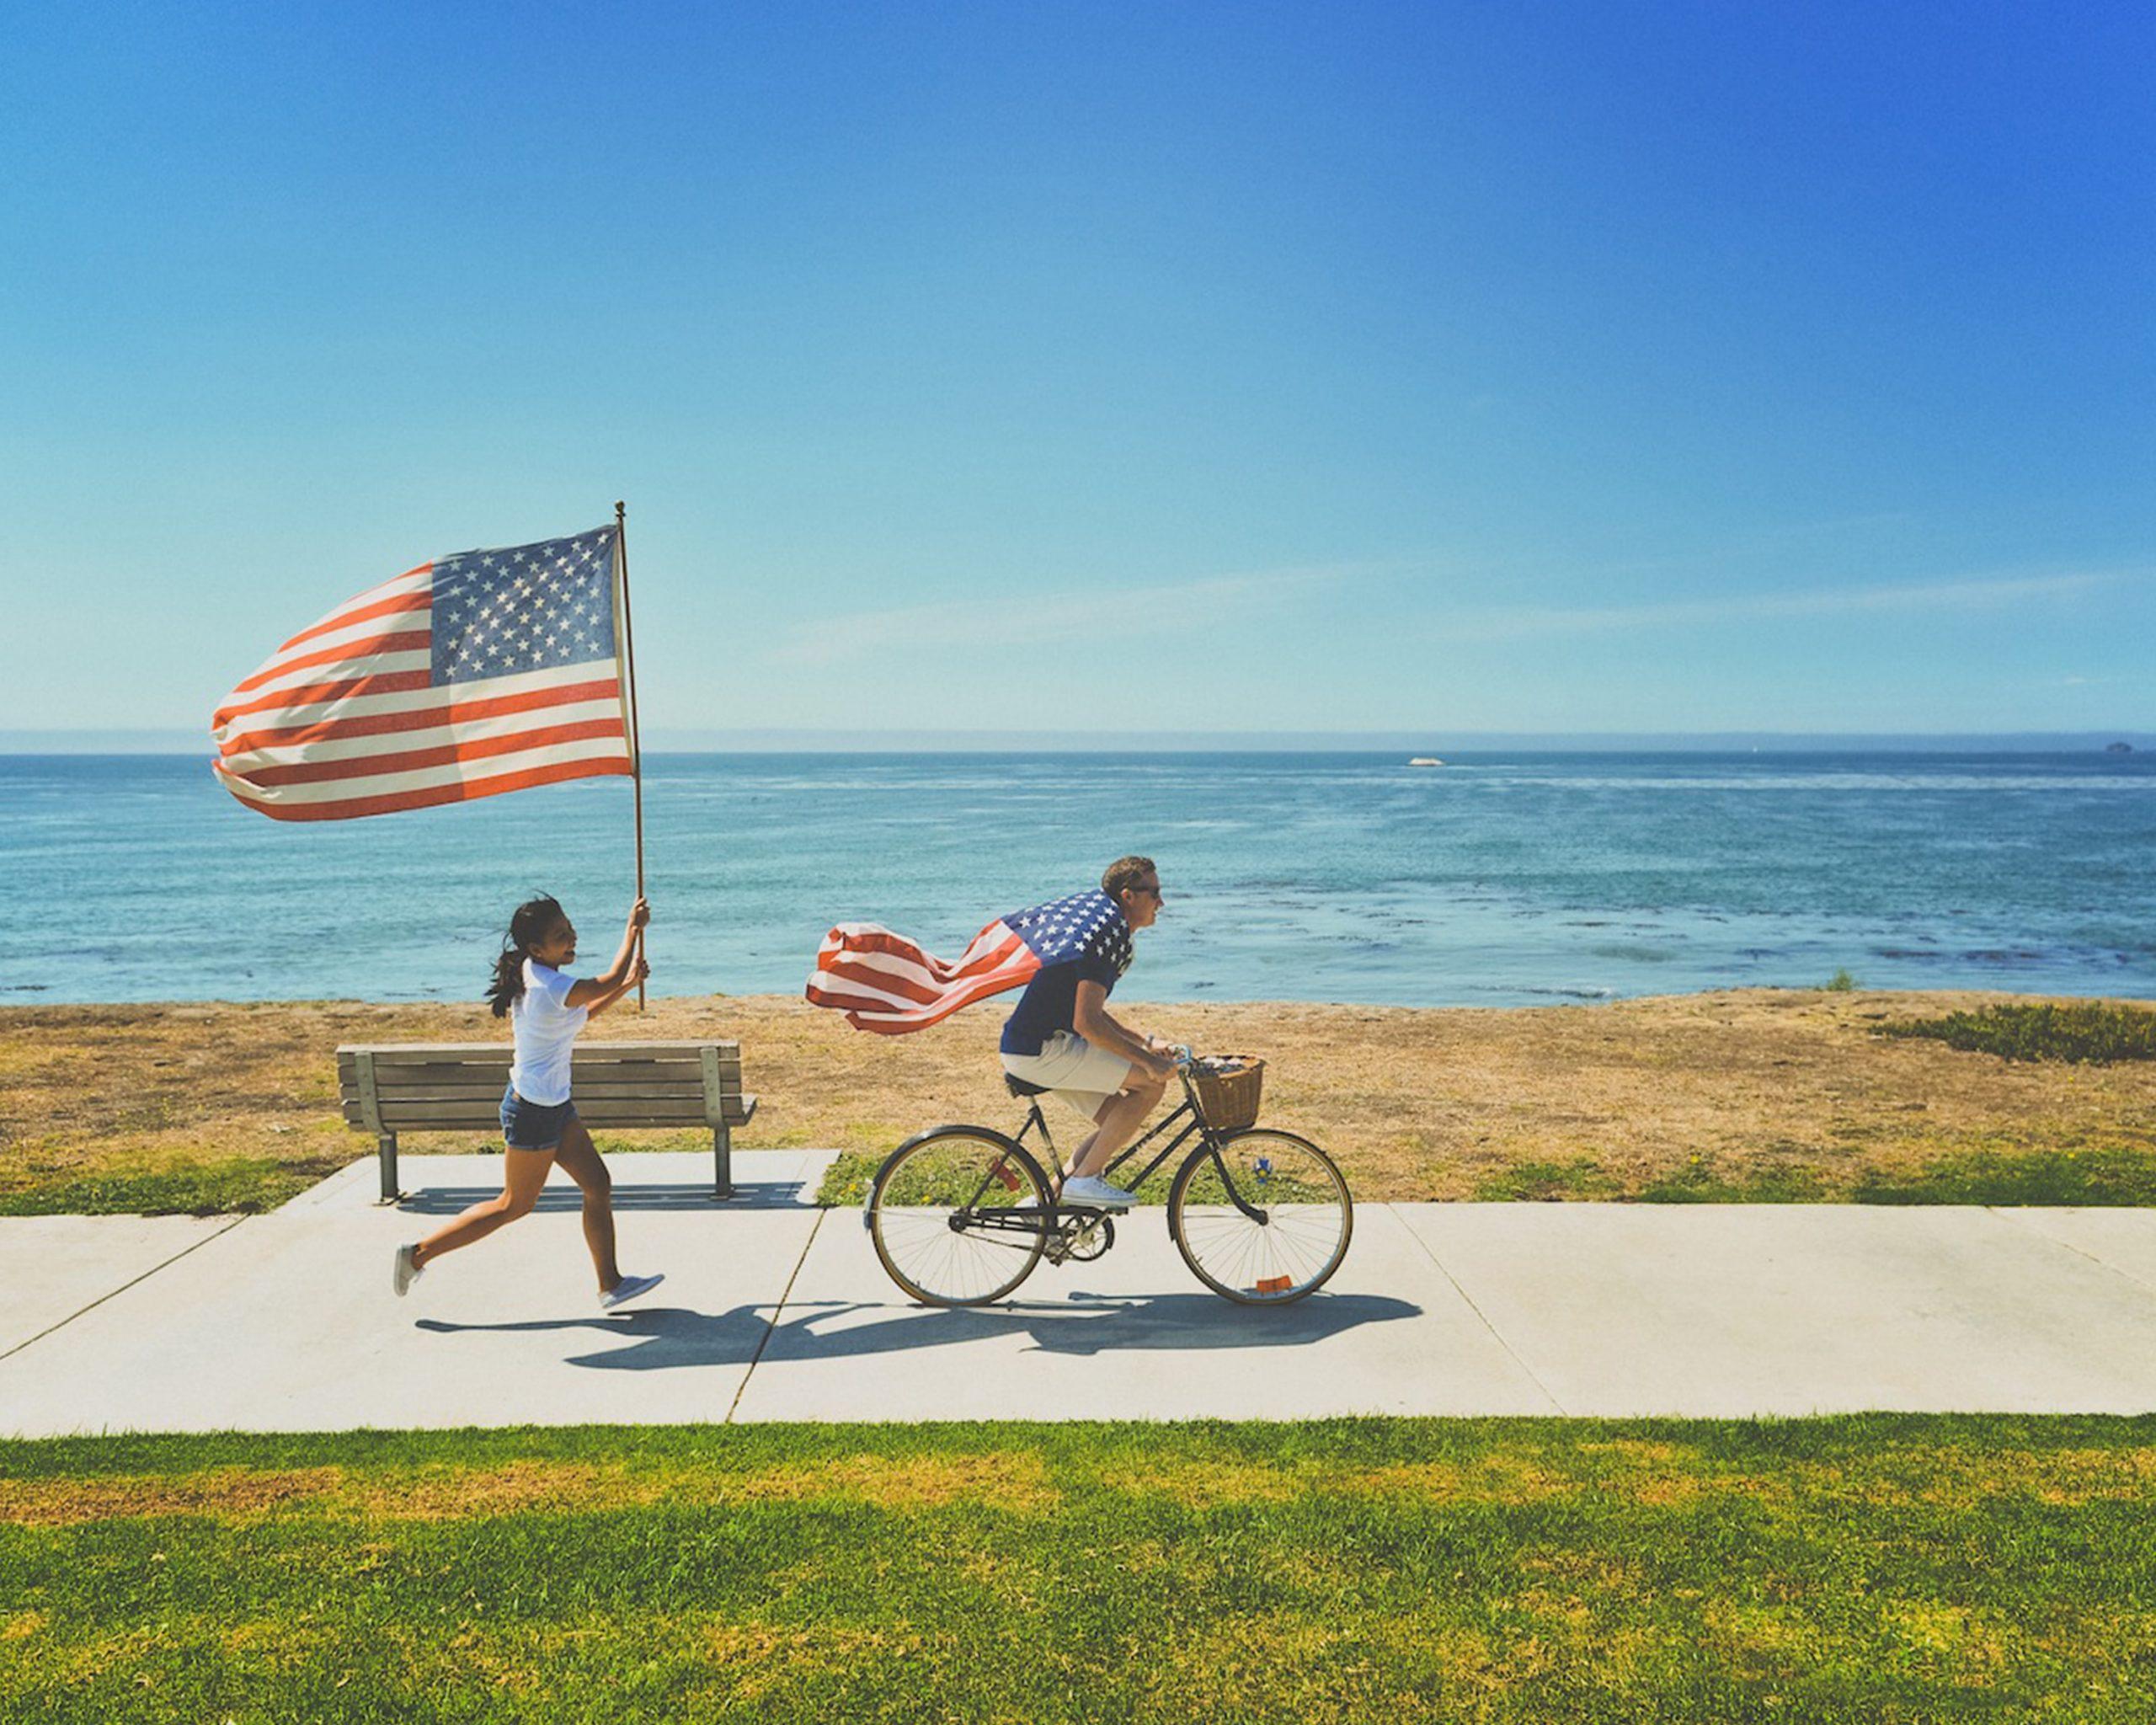 USA Flaggen Symbolfoto